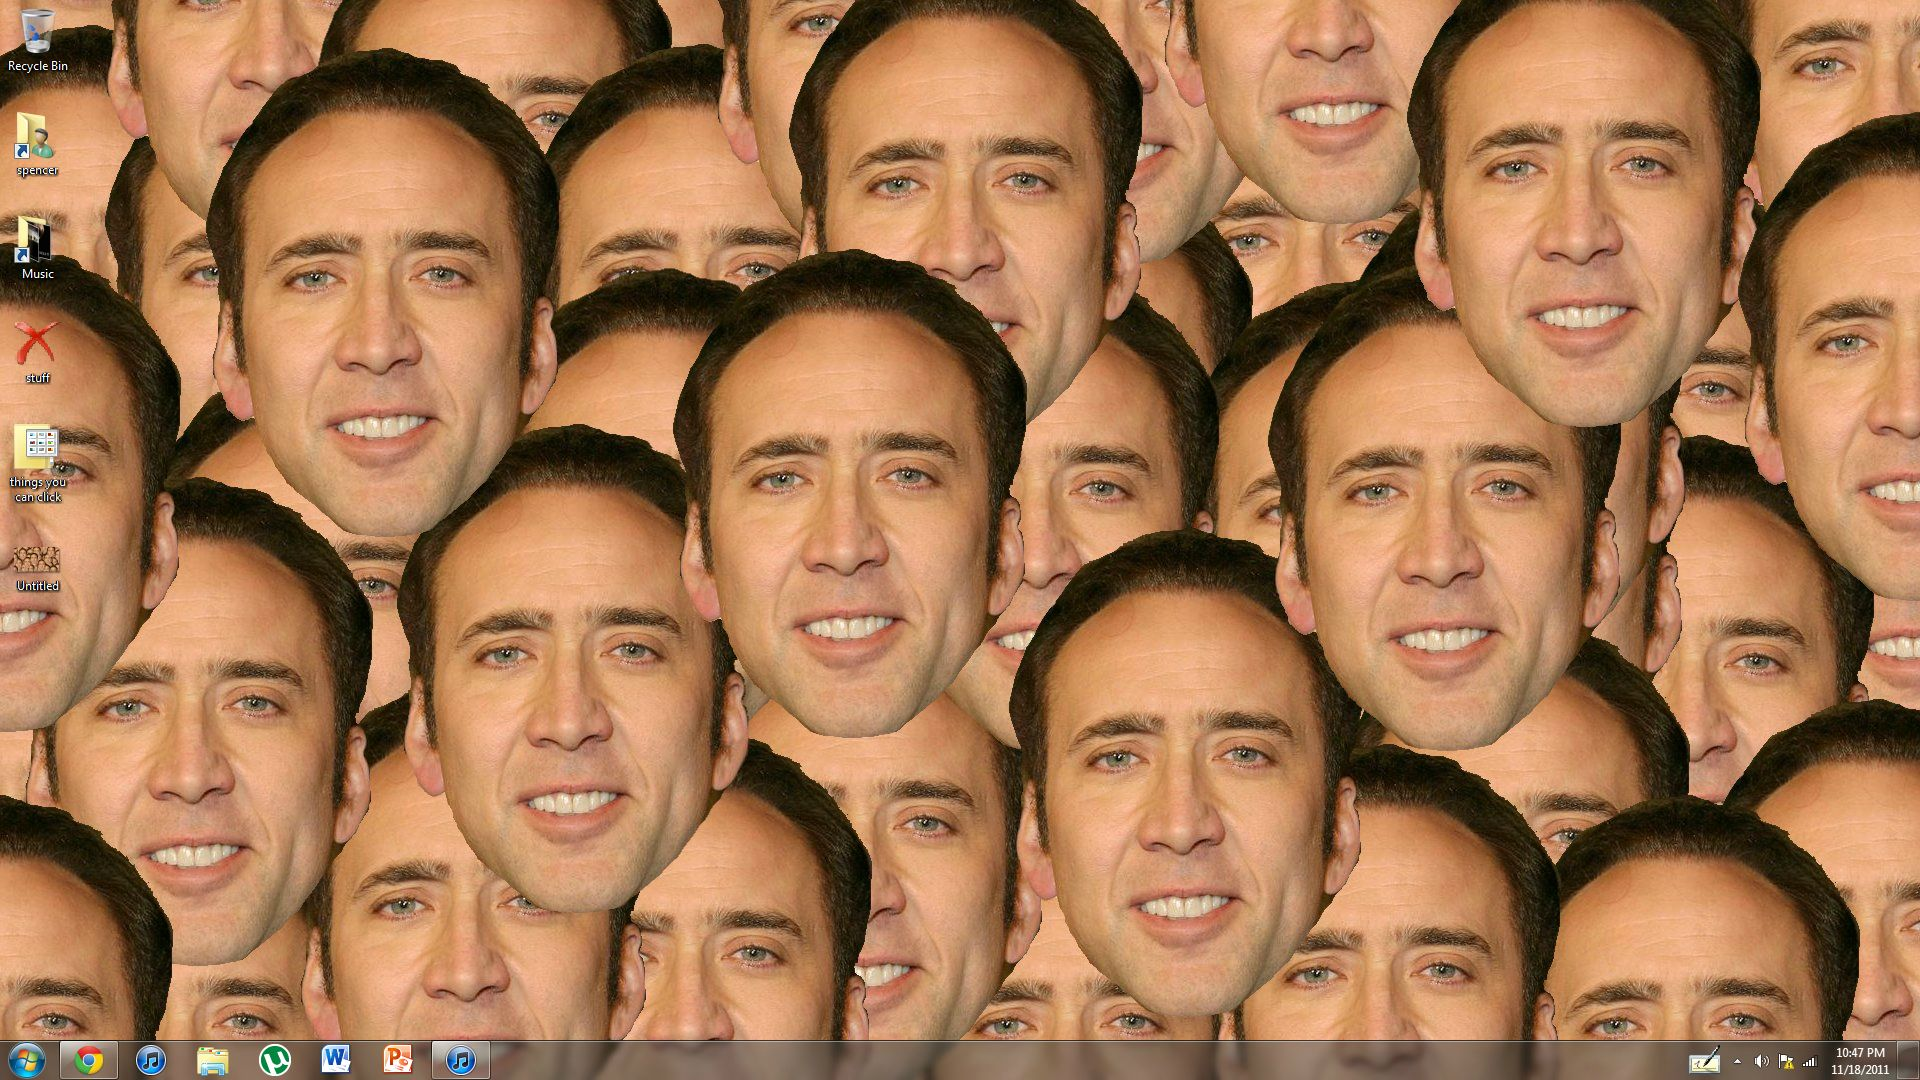 45] Funny Nicolas Cage Wallpaper on WallpaperSafari 1920x1080